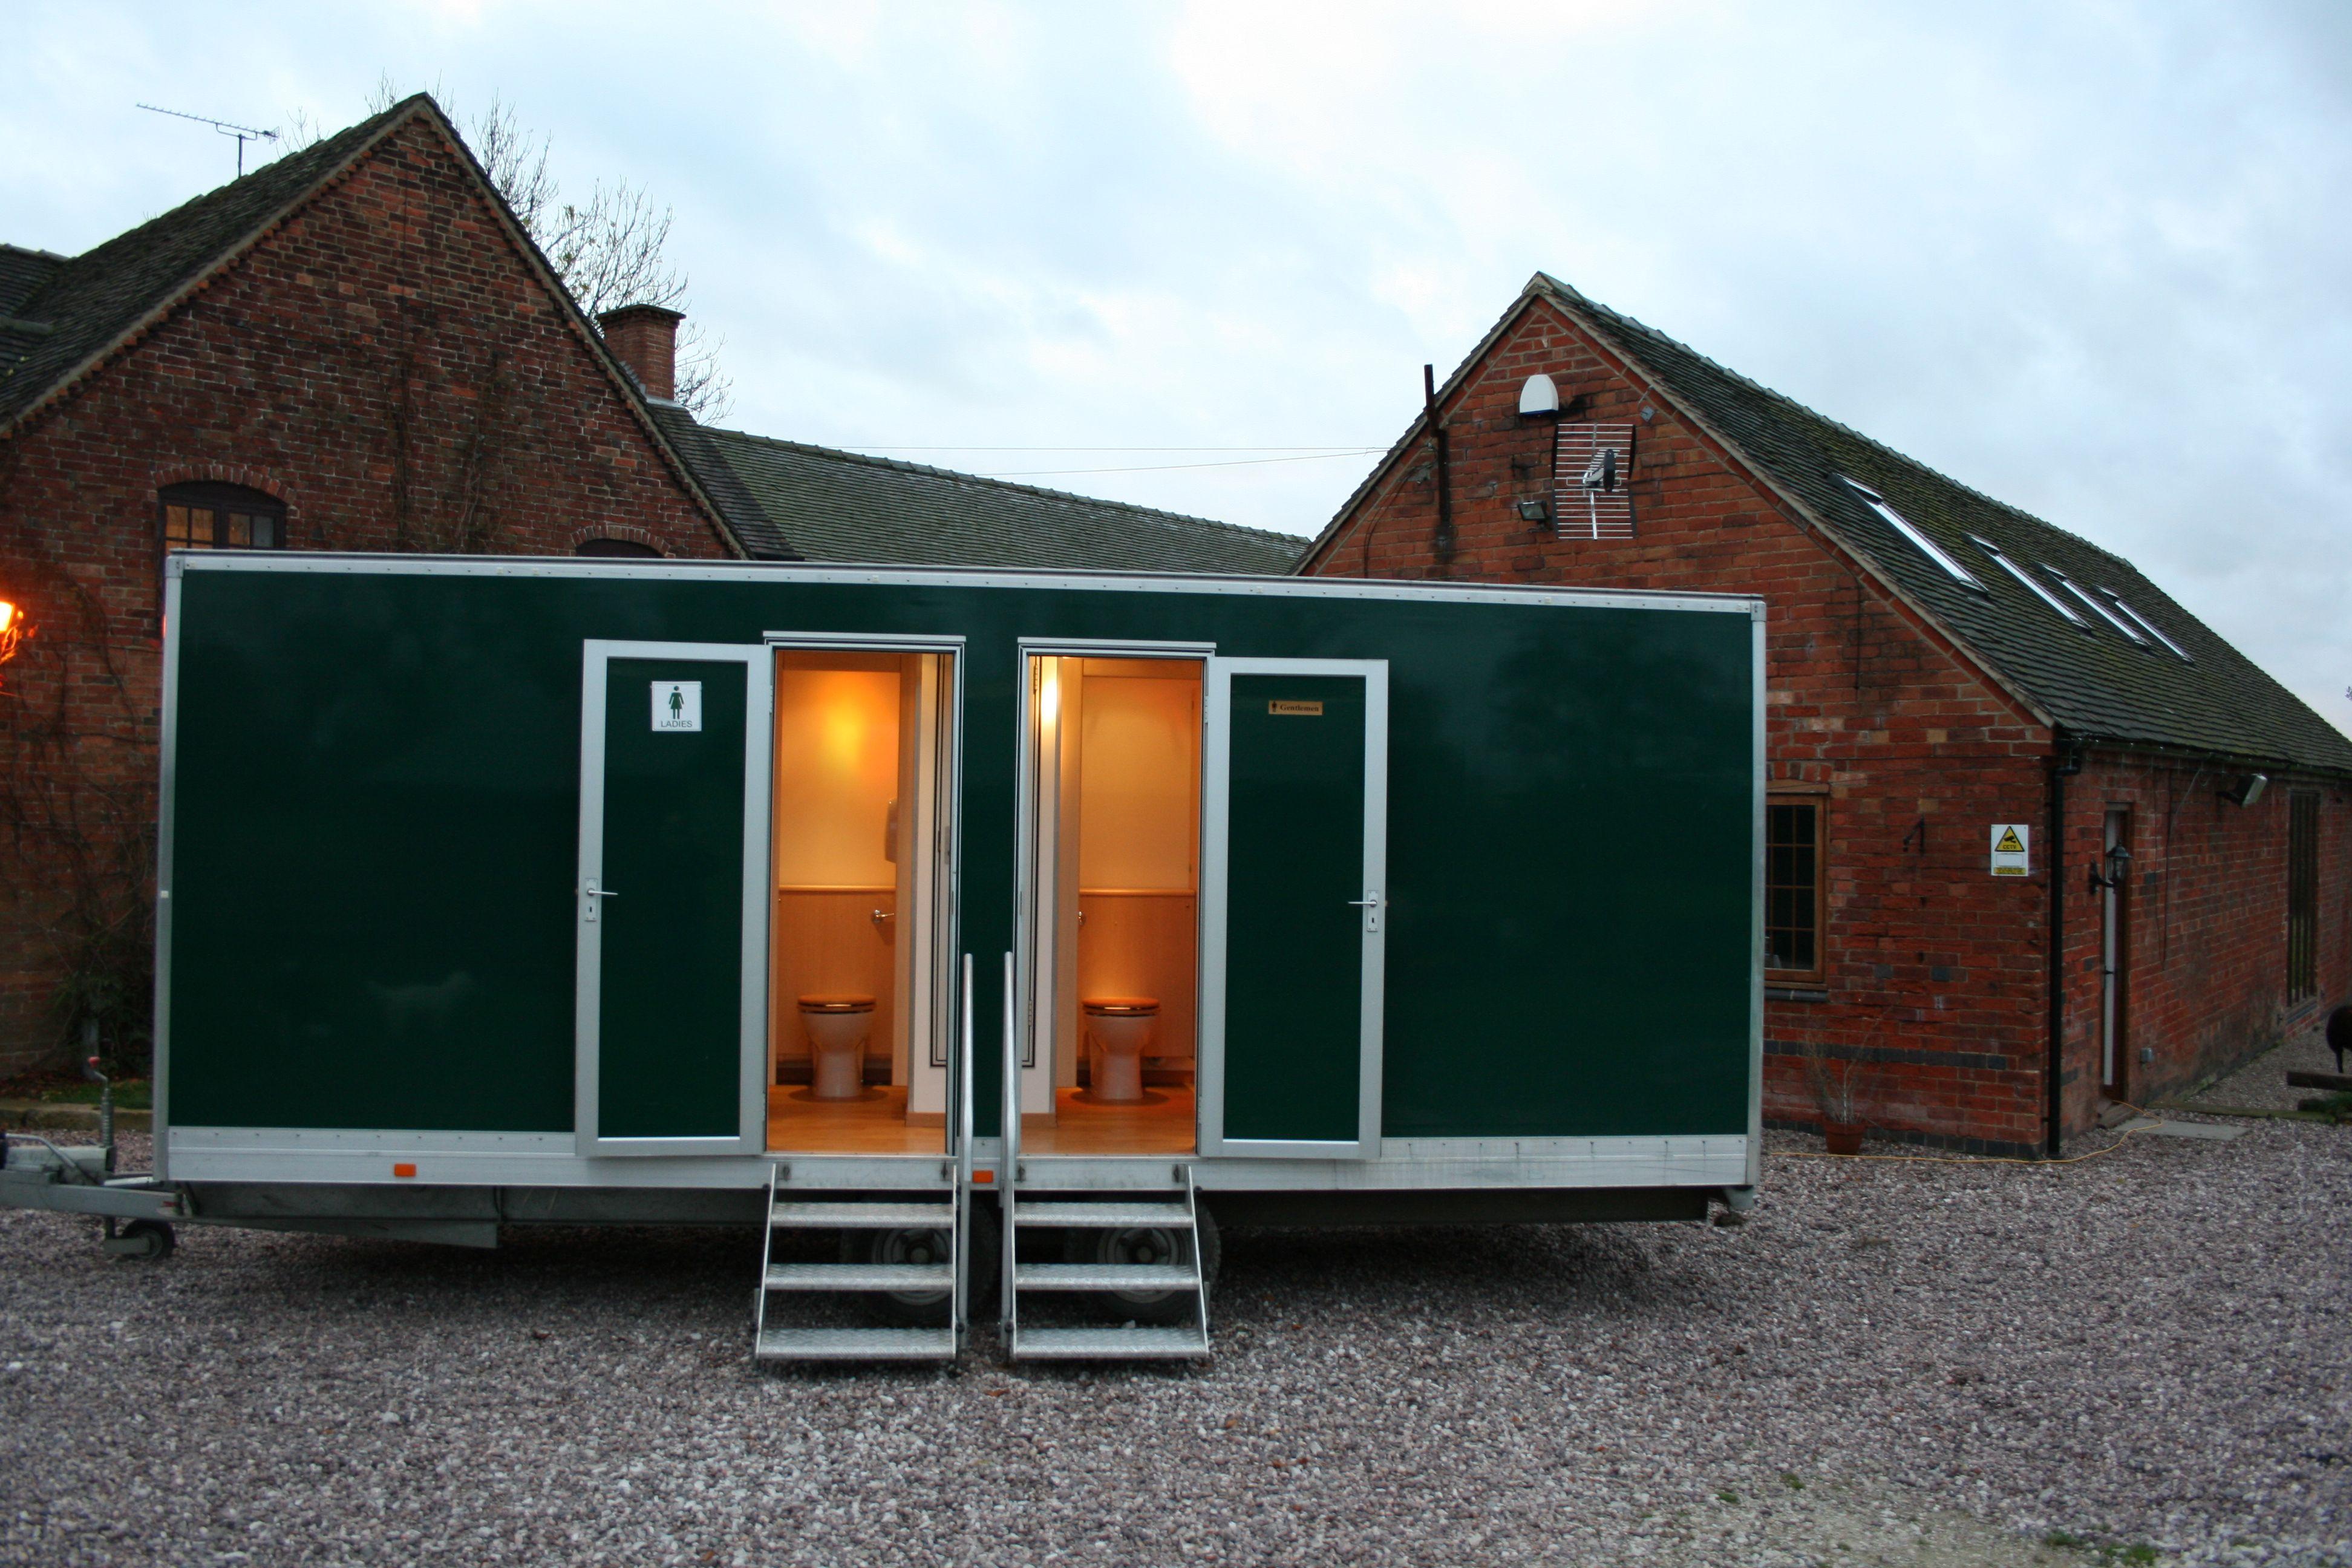 Bathroom Rentals For Weddings Home Pinterest Toilet Septic - Bathroom rentals for weddings